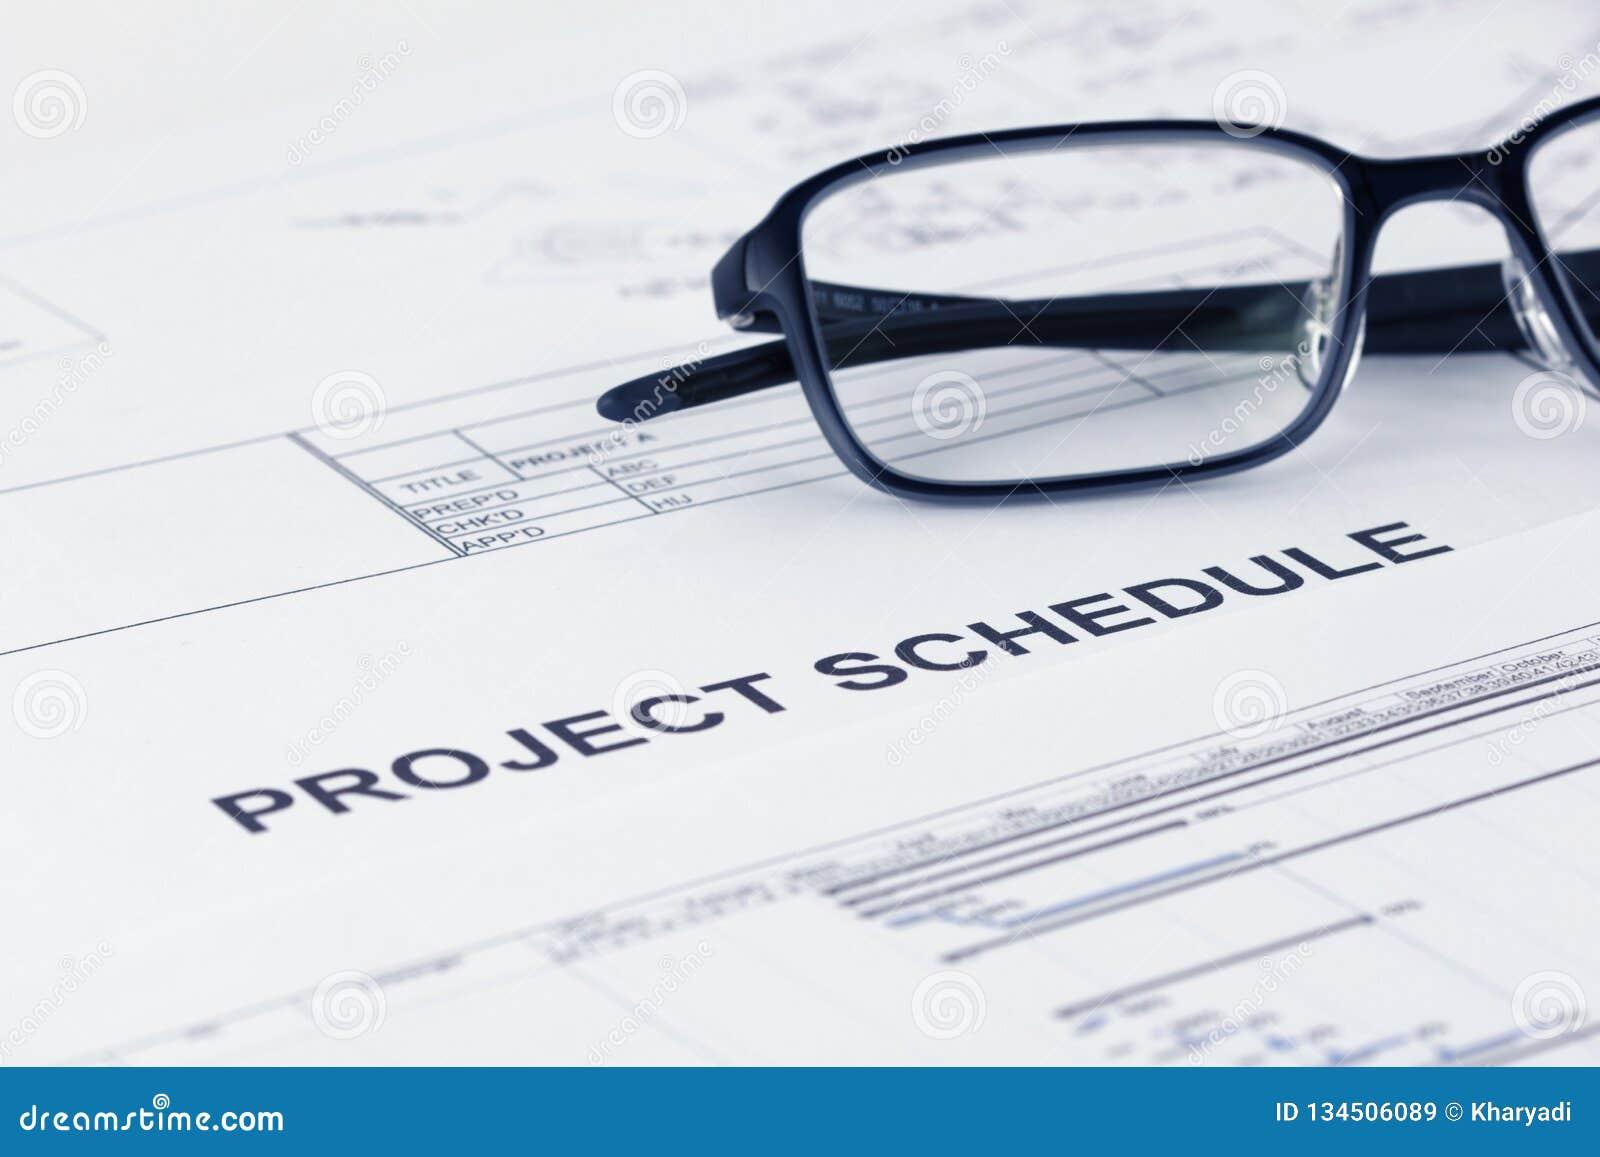 Projektzeitplan-Dokumententitel mit Projektdokumentation